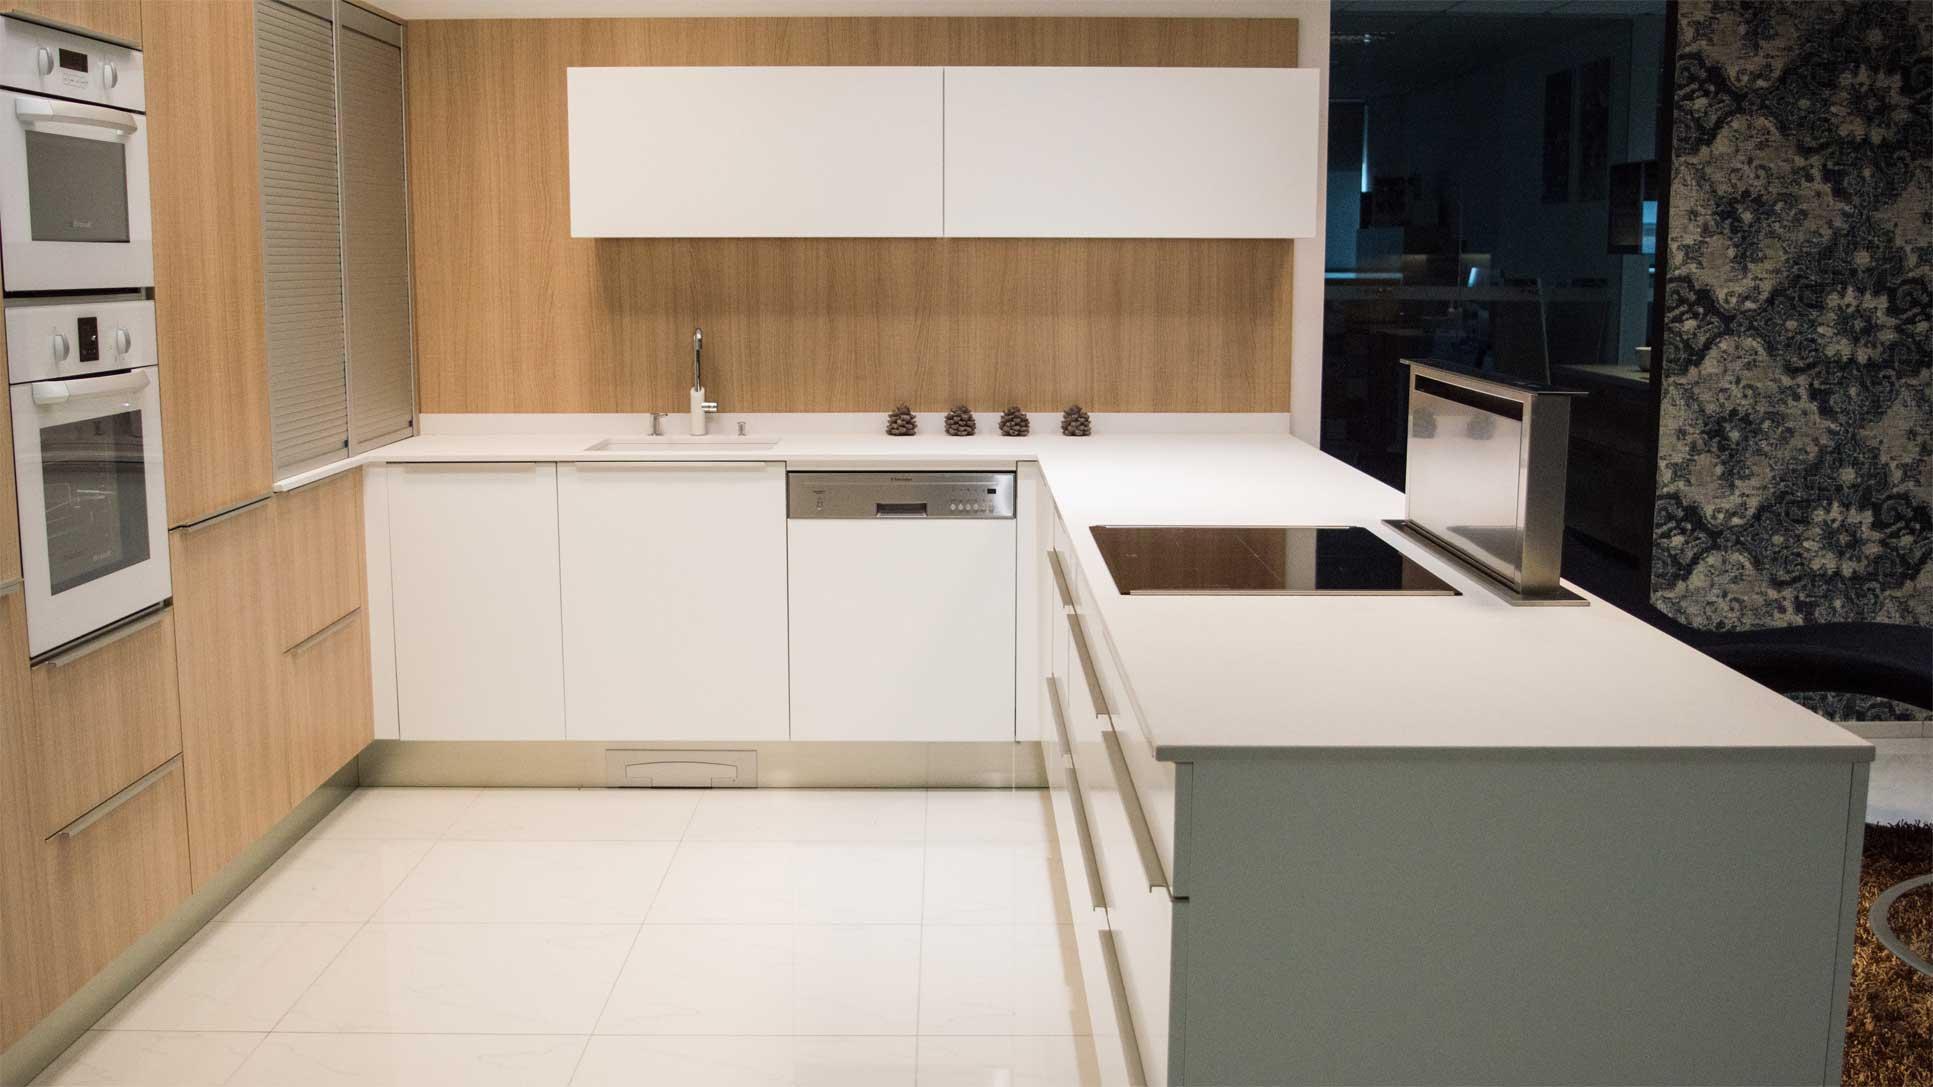 Top cucine e top bagno - Piani in quarzo per cucine ...